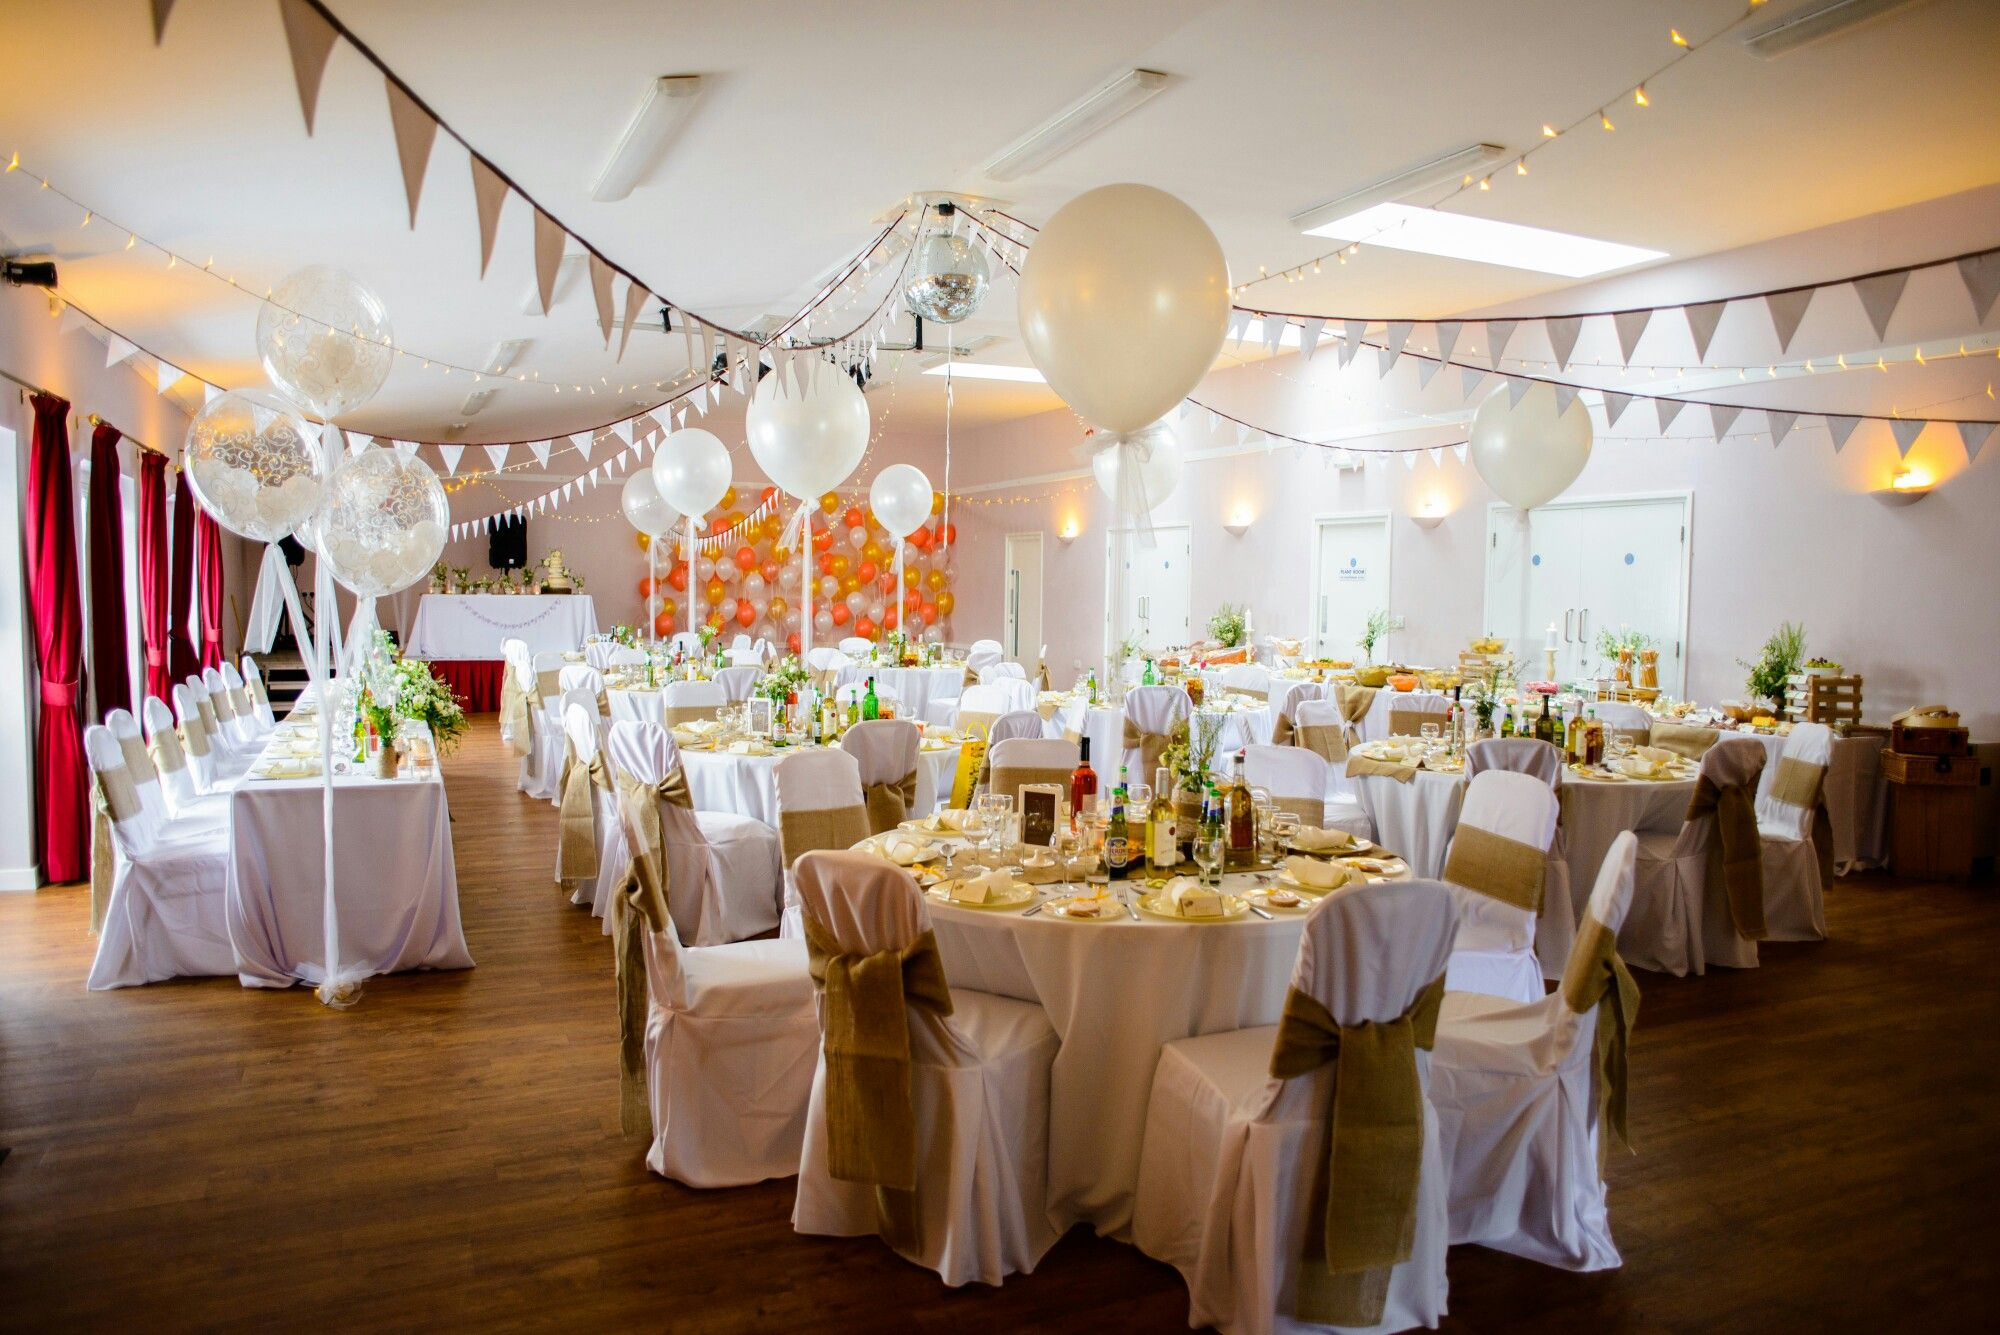 Wedding decoration ideas balloons  Simple village hall transformed in DIY wedding Bunting balloons